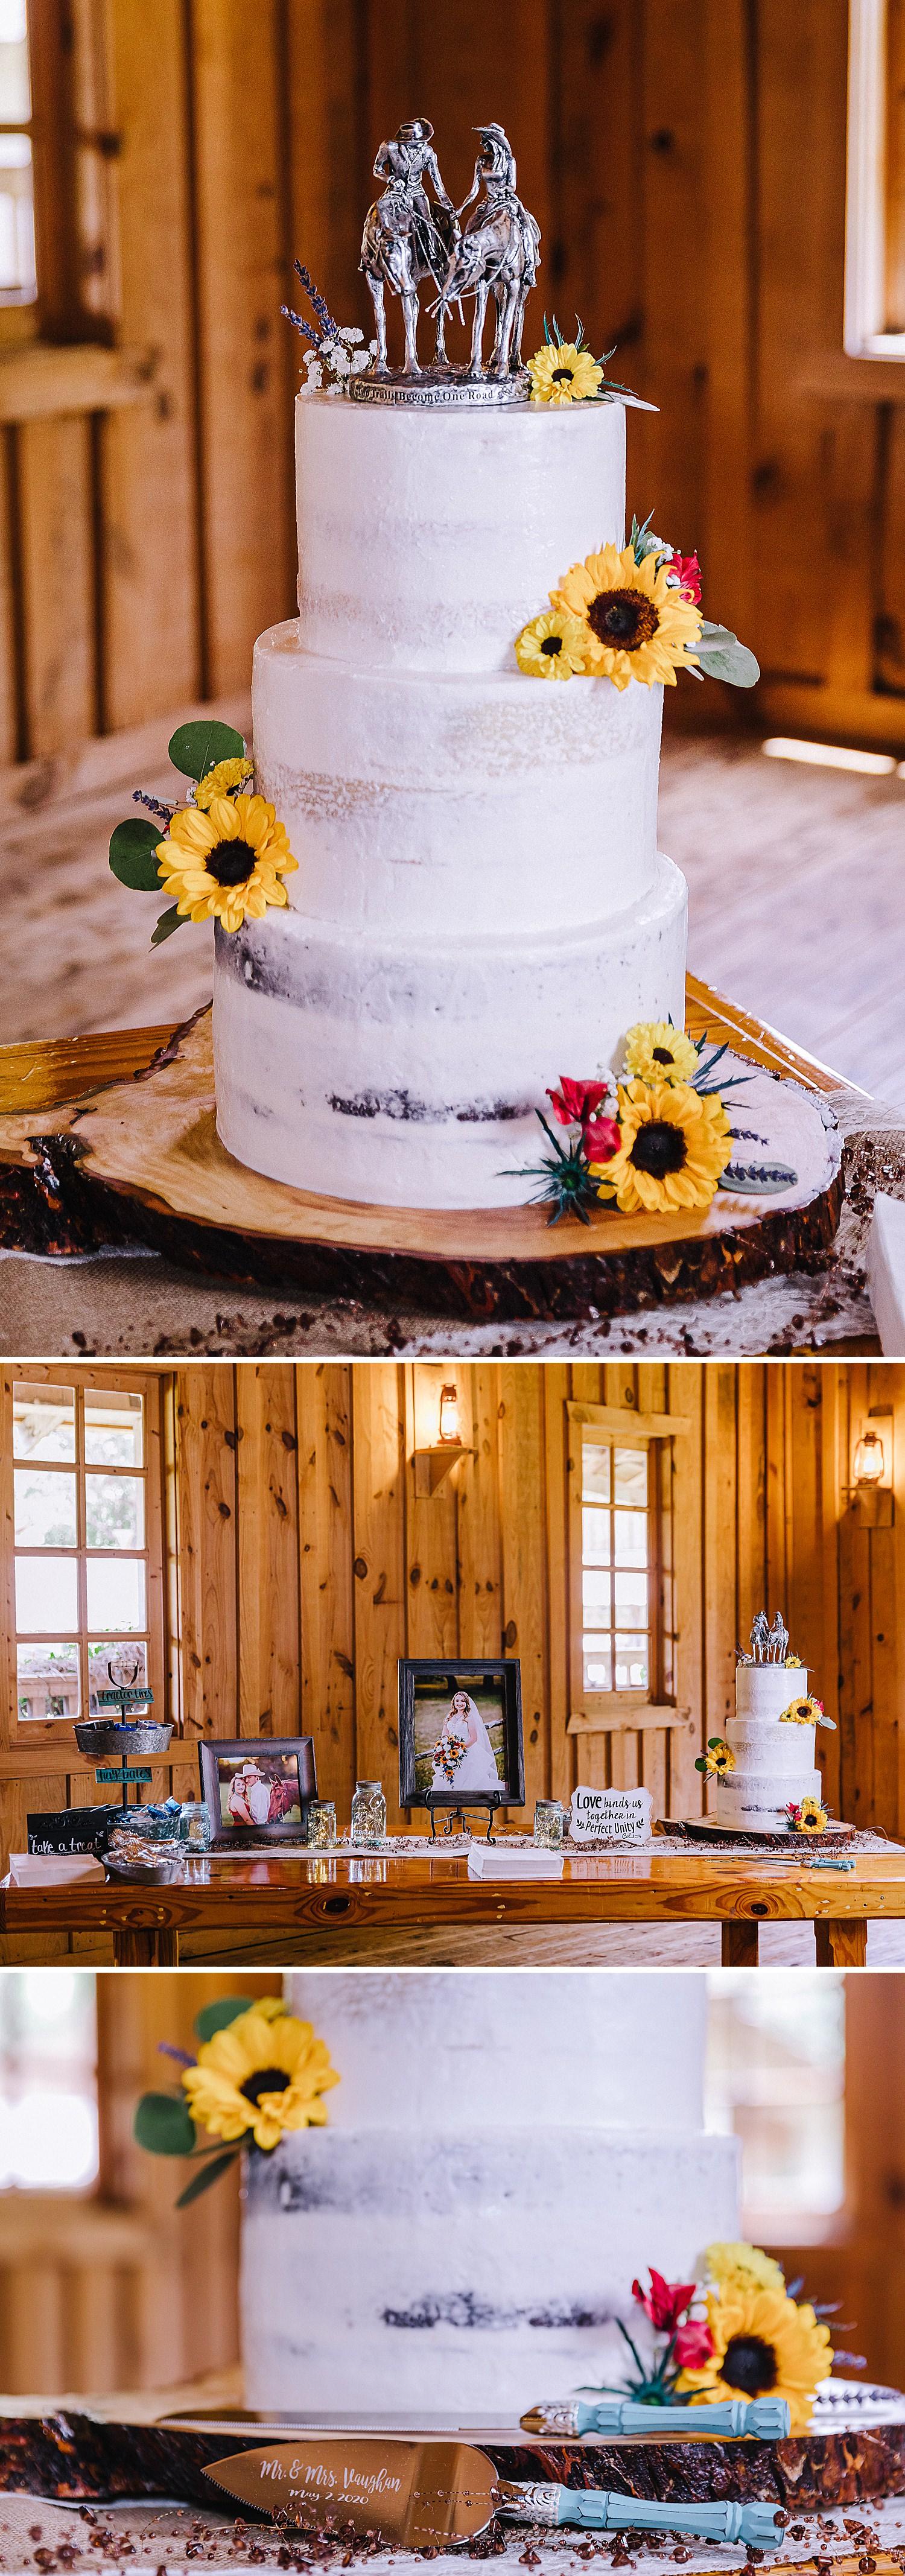 Carly-Barton-Photography-Old-Town-Texas-Rustic-Wedding-Photos-Sunflowers-Boots-Kyle-Texas_0011.jpg